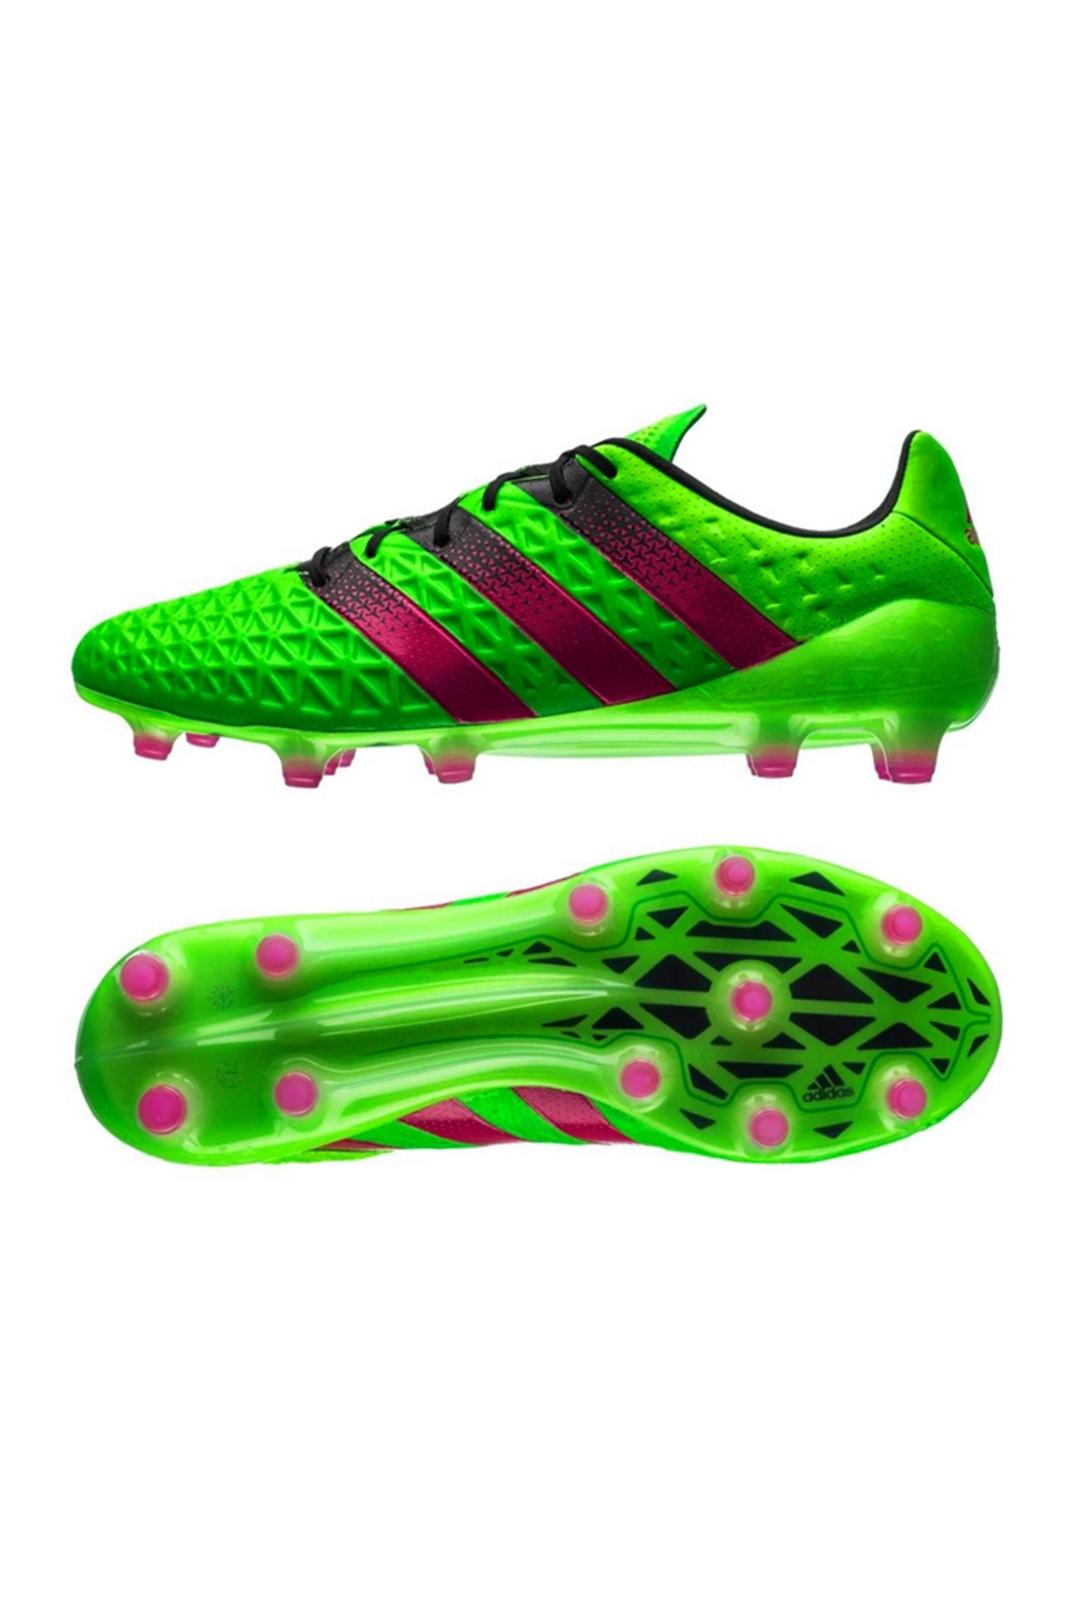 Chaussures   Adidas AQ5151 ACE 16.1 FG/AG VERT